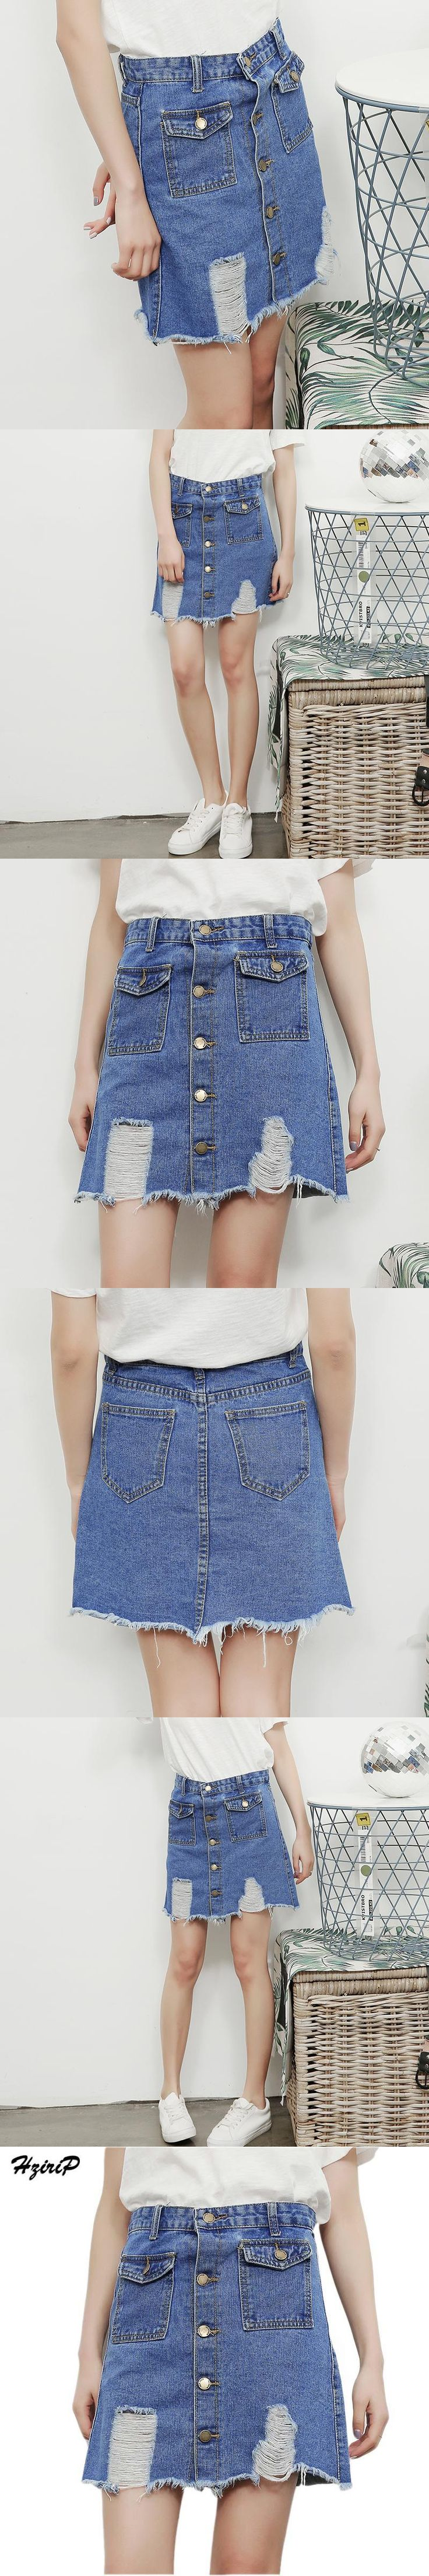 HziriP New Fashion Women High Waist Denim Skirt Ladies Ripped Jeans Skirt 2017 Spring Summer Femme Casual A-line Mini Hole Skirt